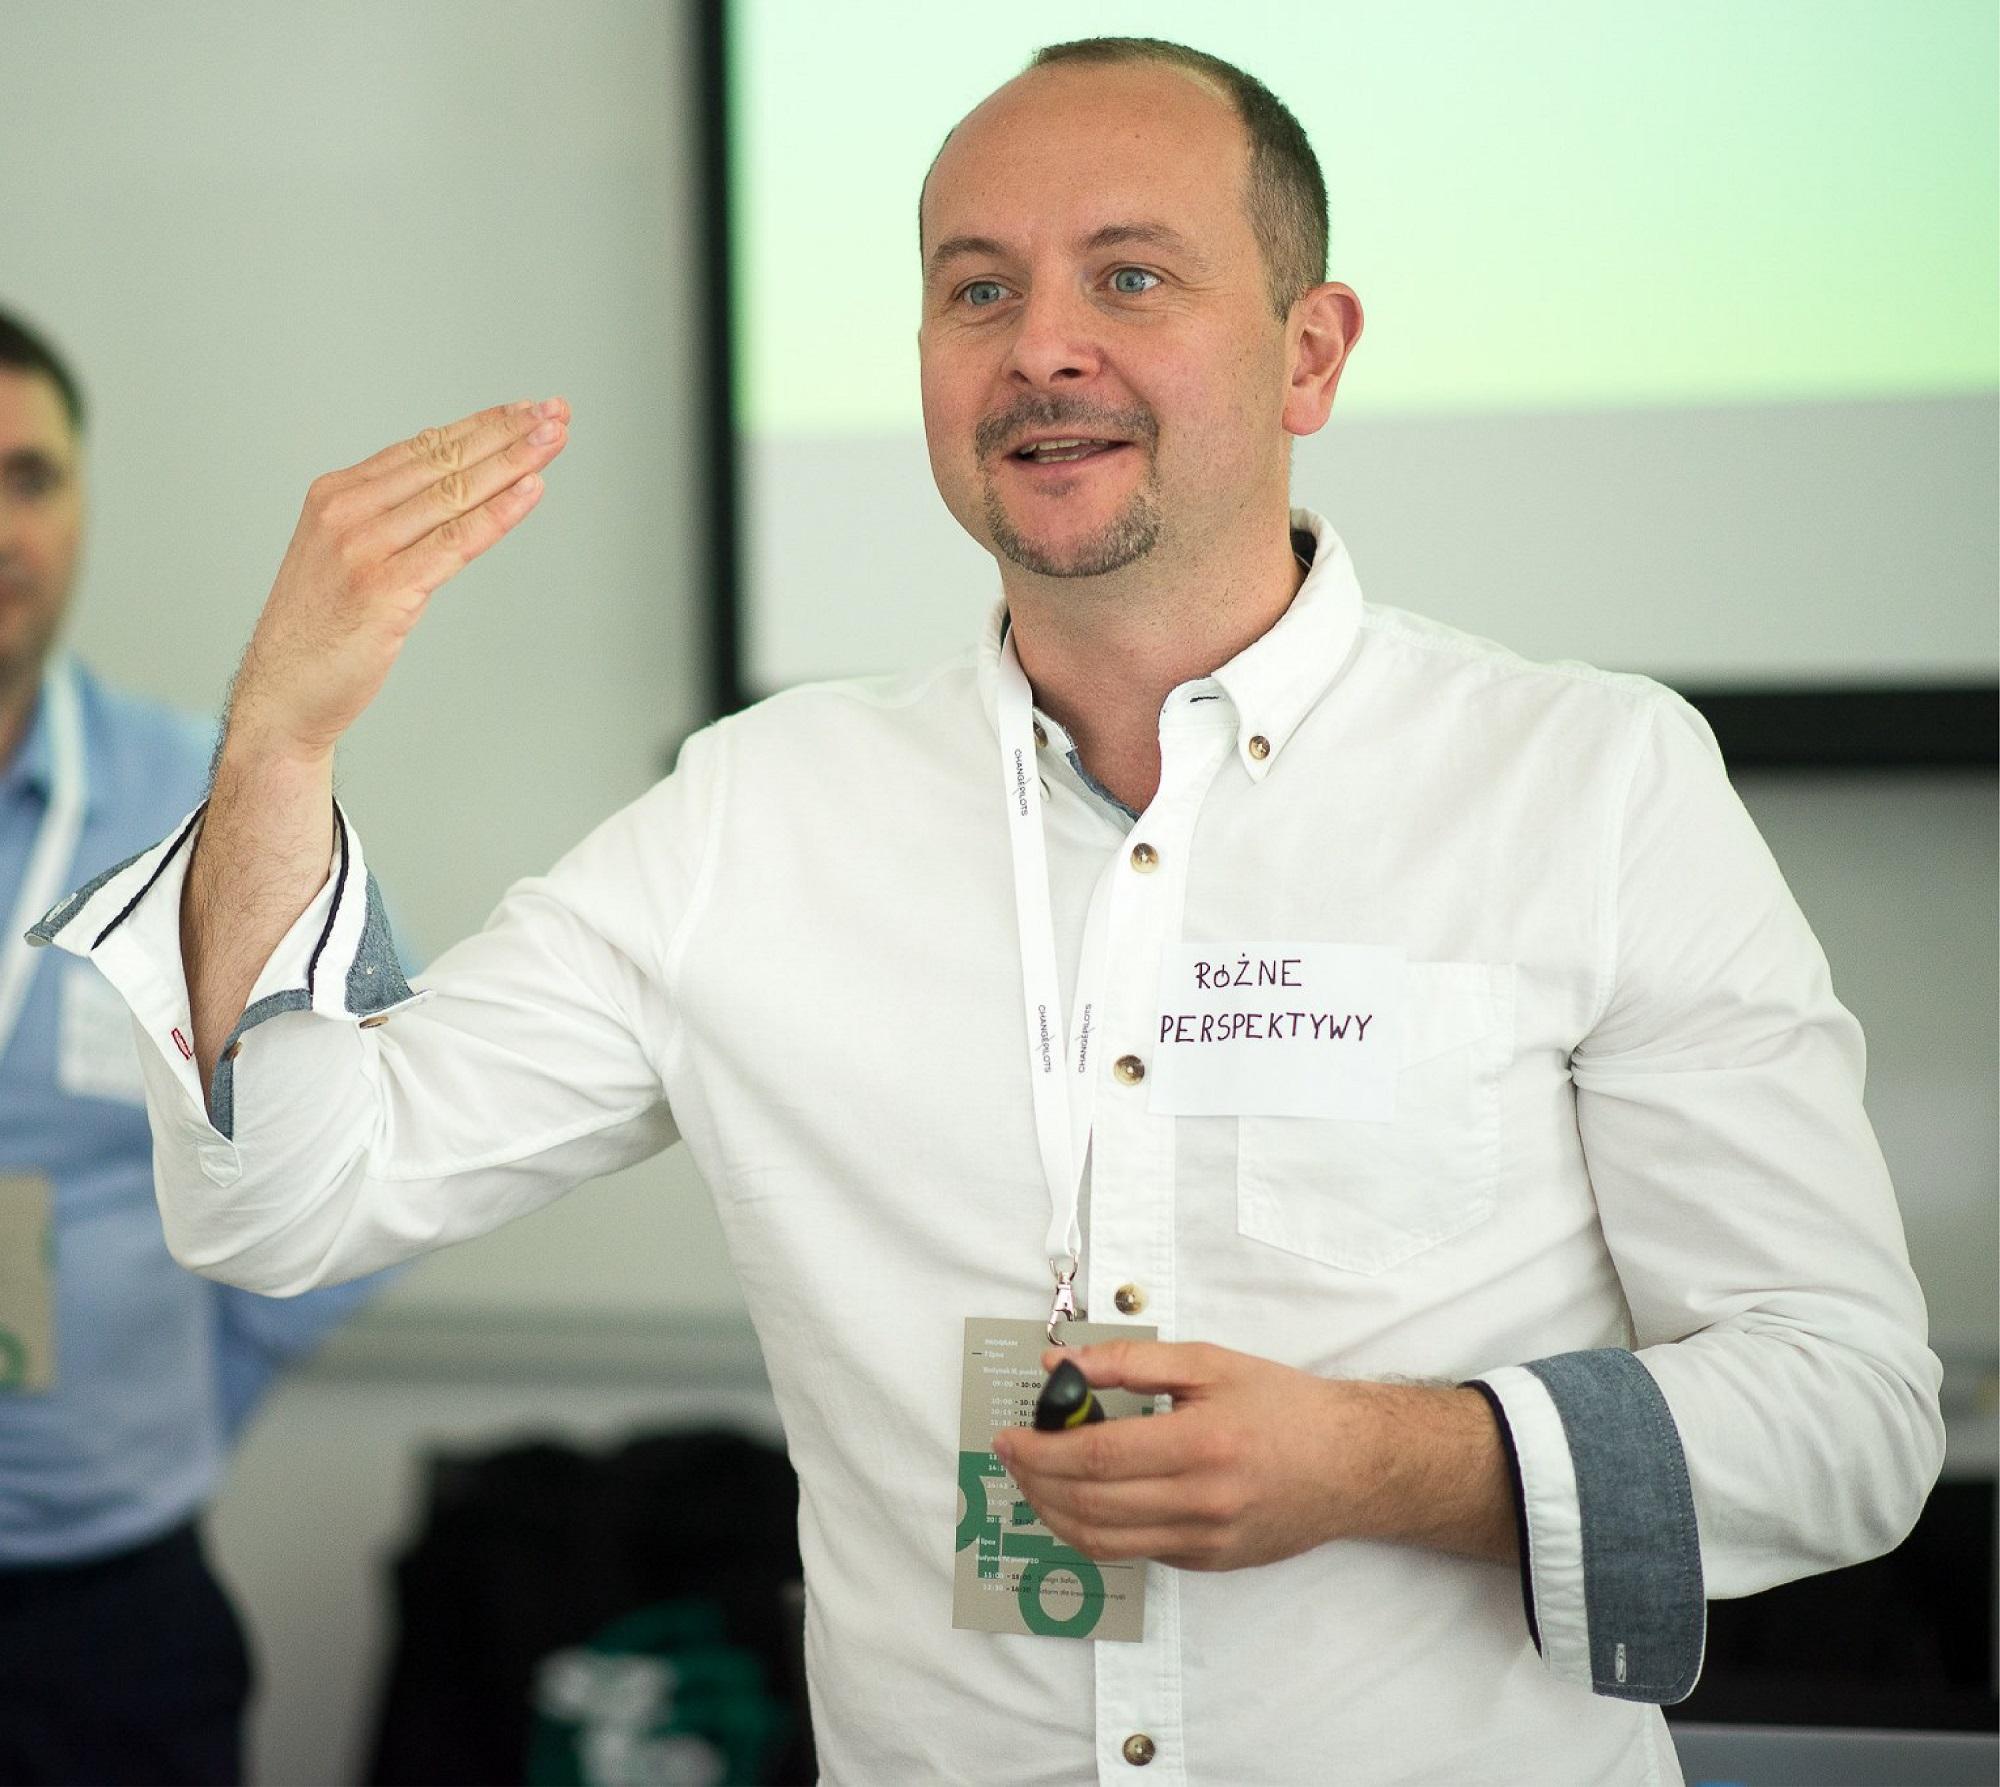 Piotr Grocholiński